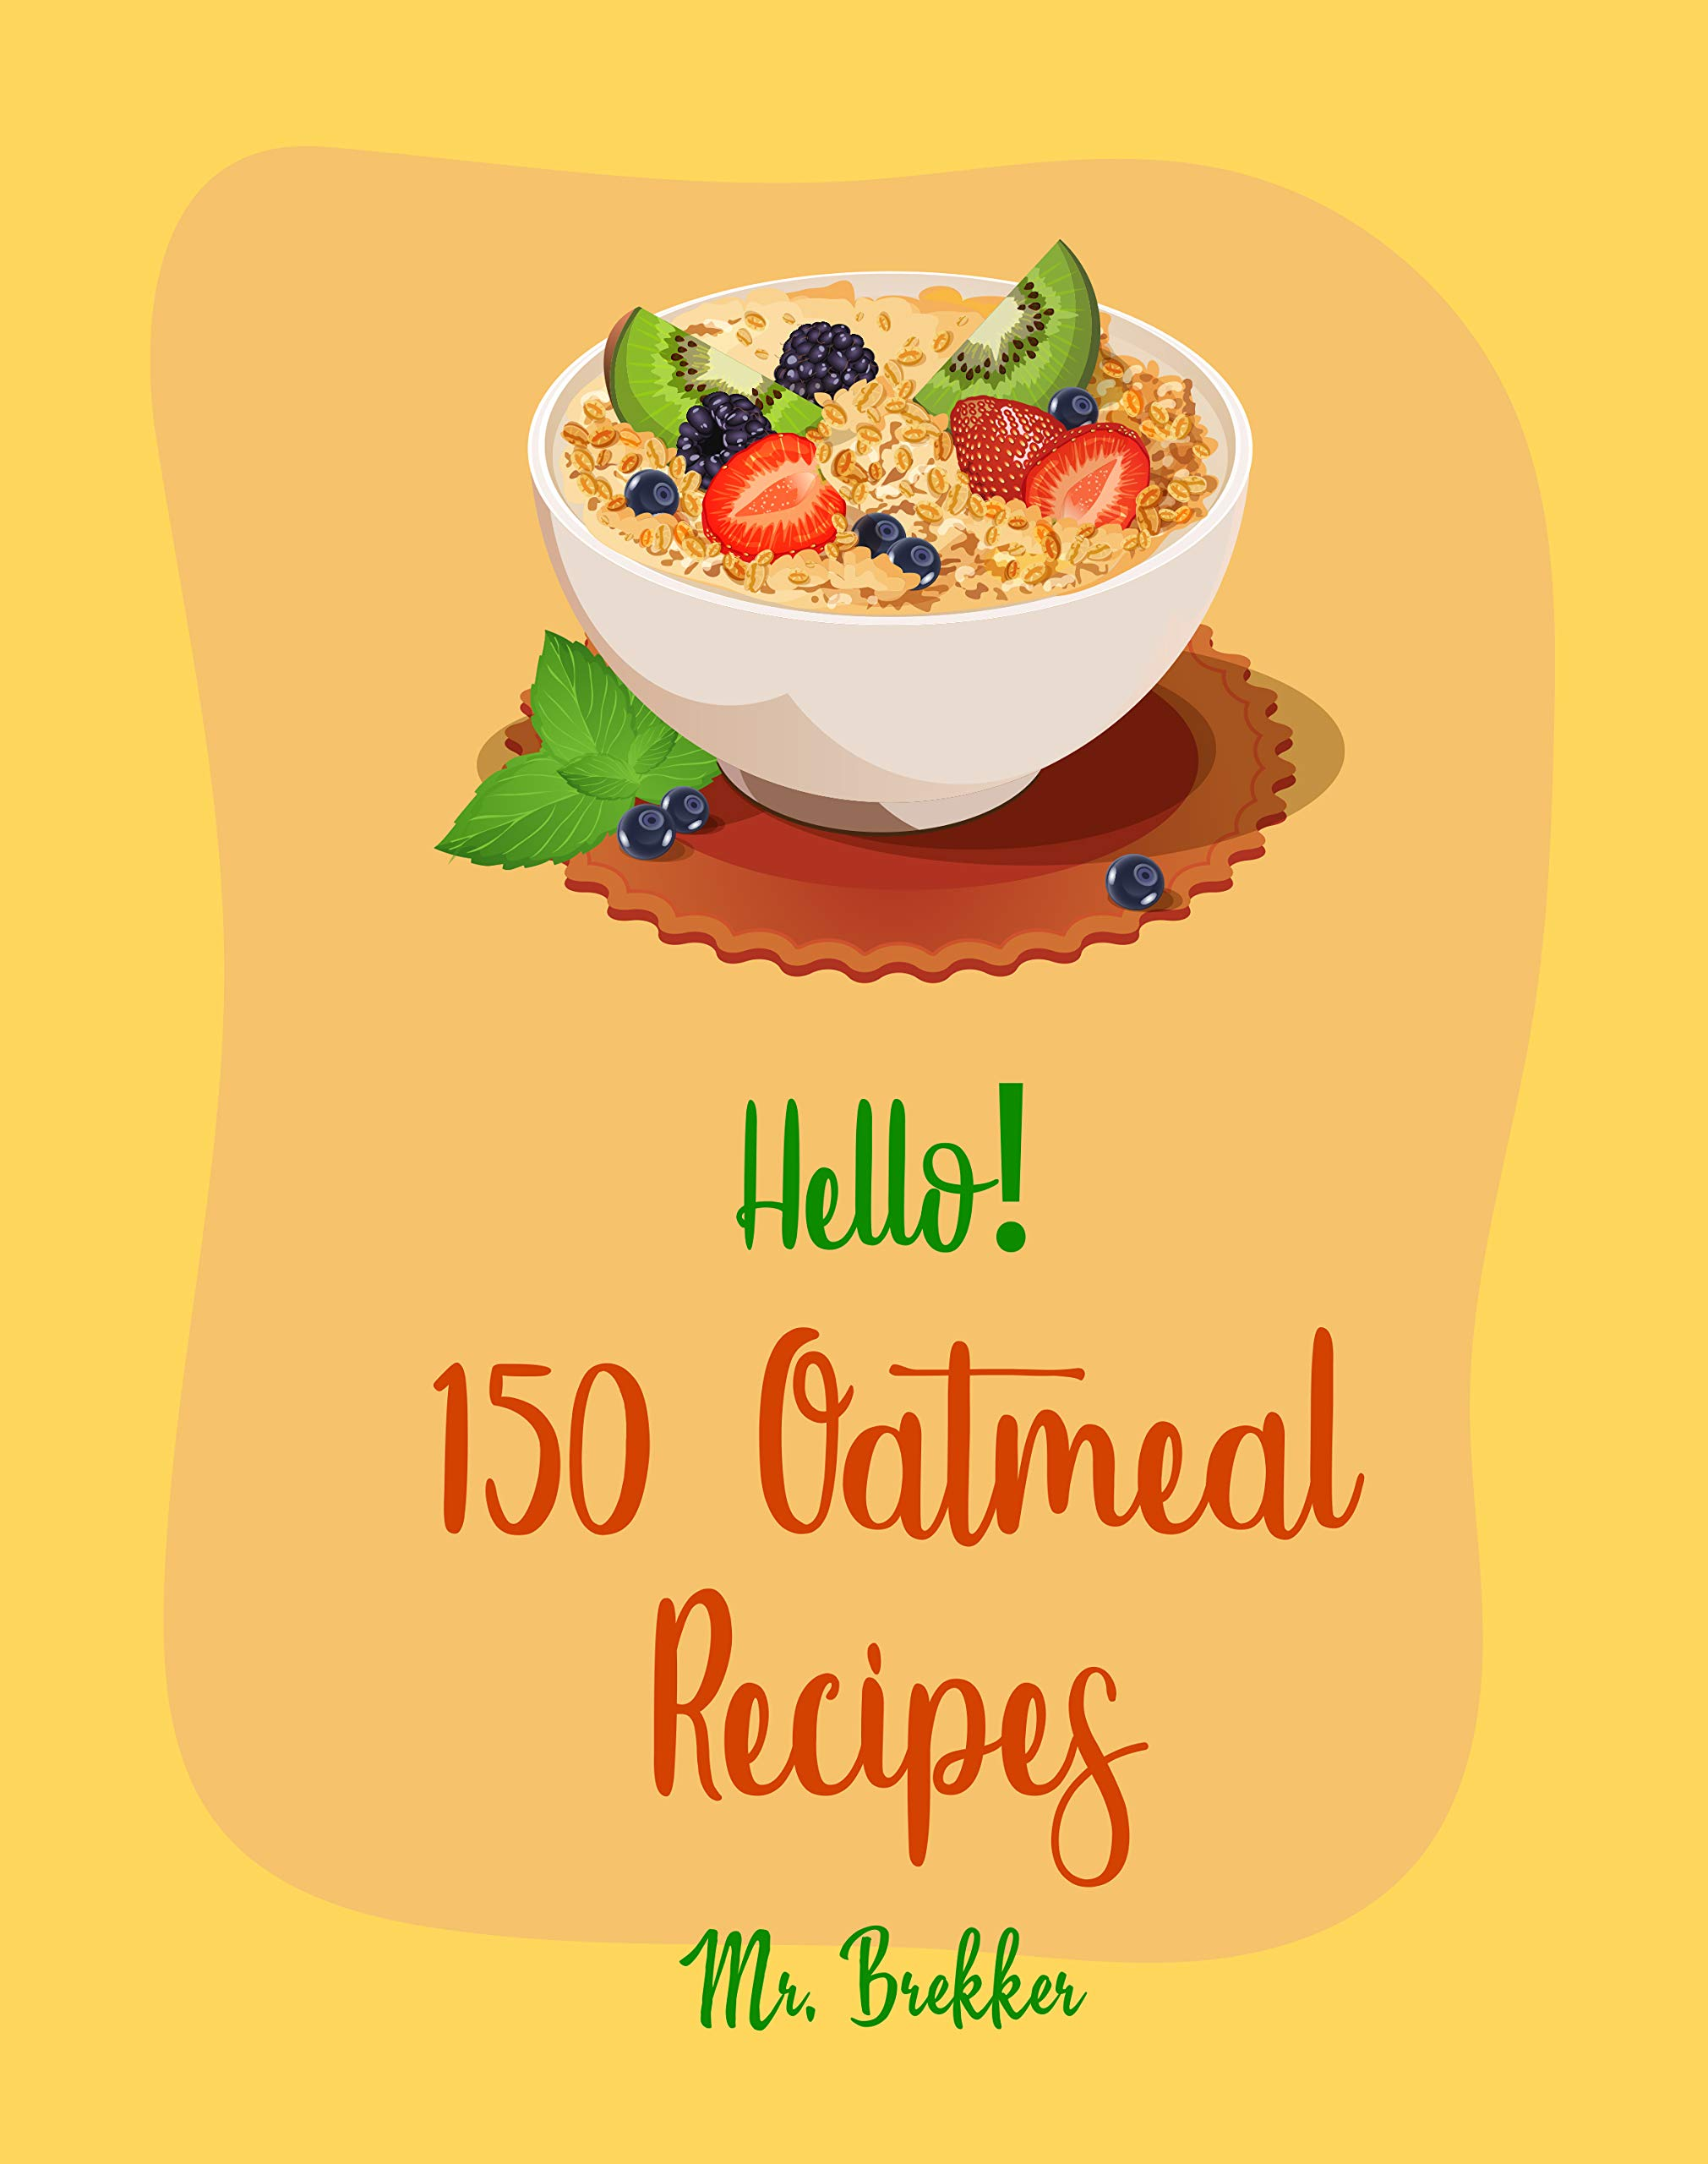 Hello  150 Oatmeal Recipes  Best Oatmeal Cookbook Ever For Beginners  Banana Bread Cookbook Dark Chocolate Cookbook Pumpkin Spice Cookbook Maple Syrup ... Oats Recipes   Book 1   English Edition